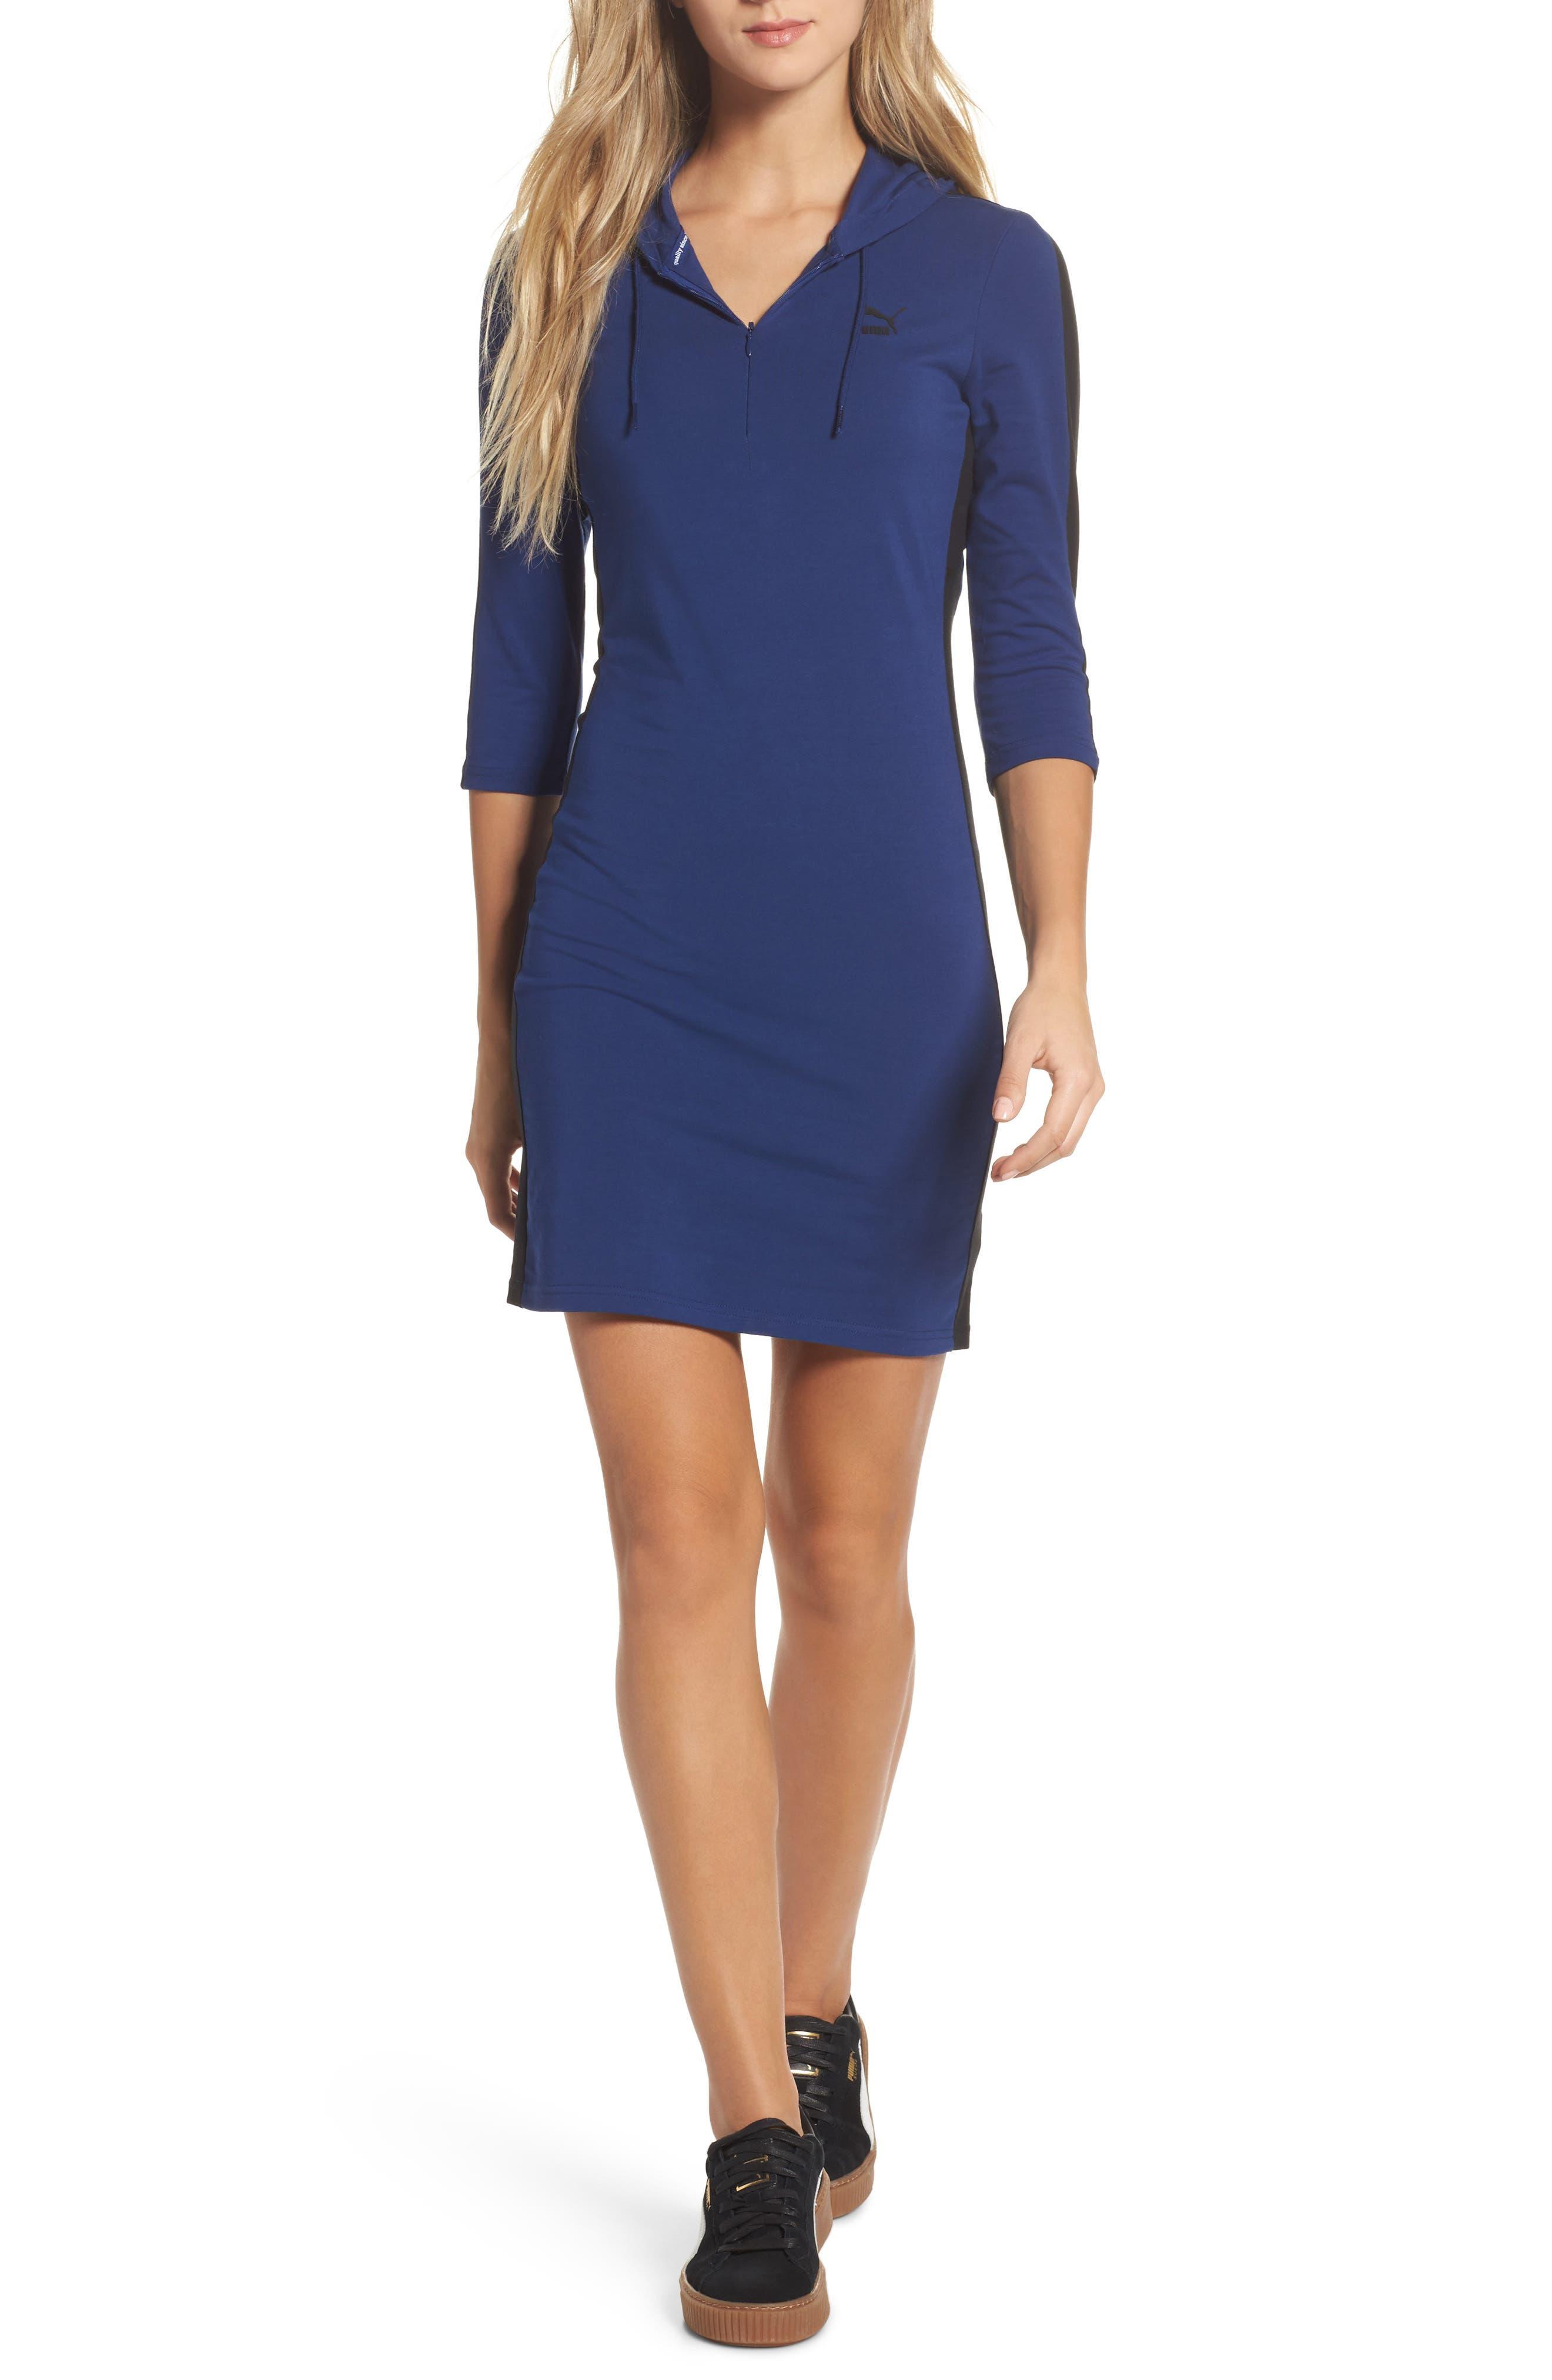 T7 Sweatshirt Dress,                         Main,                         color, Blue Depths